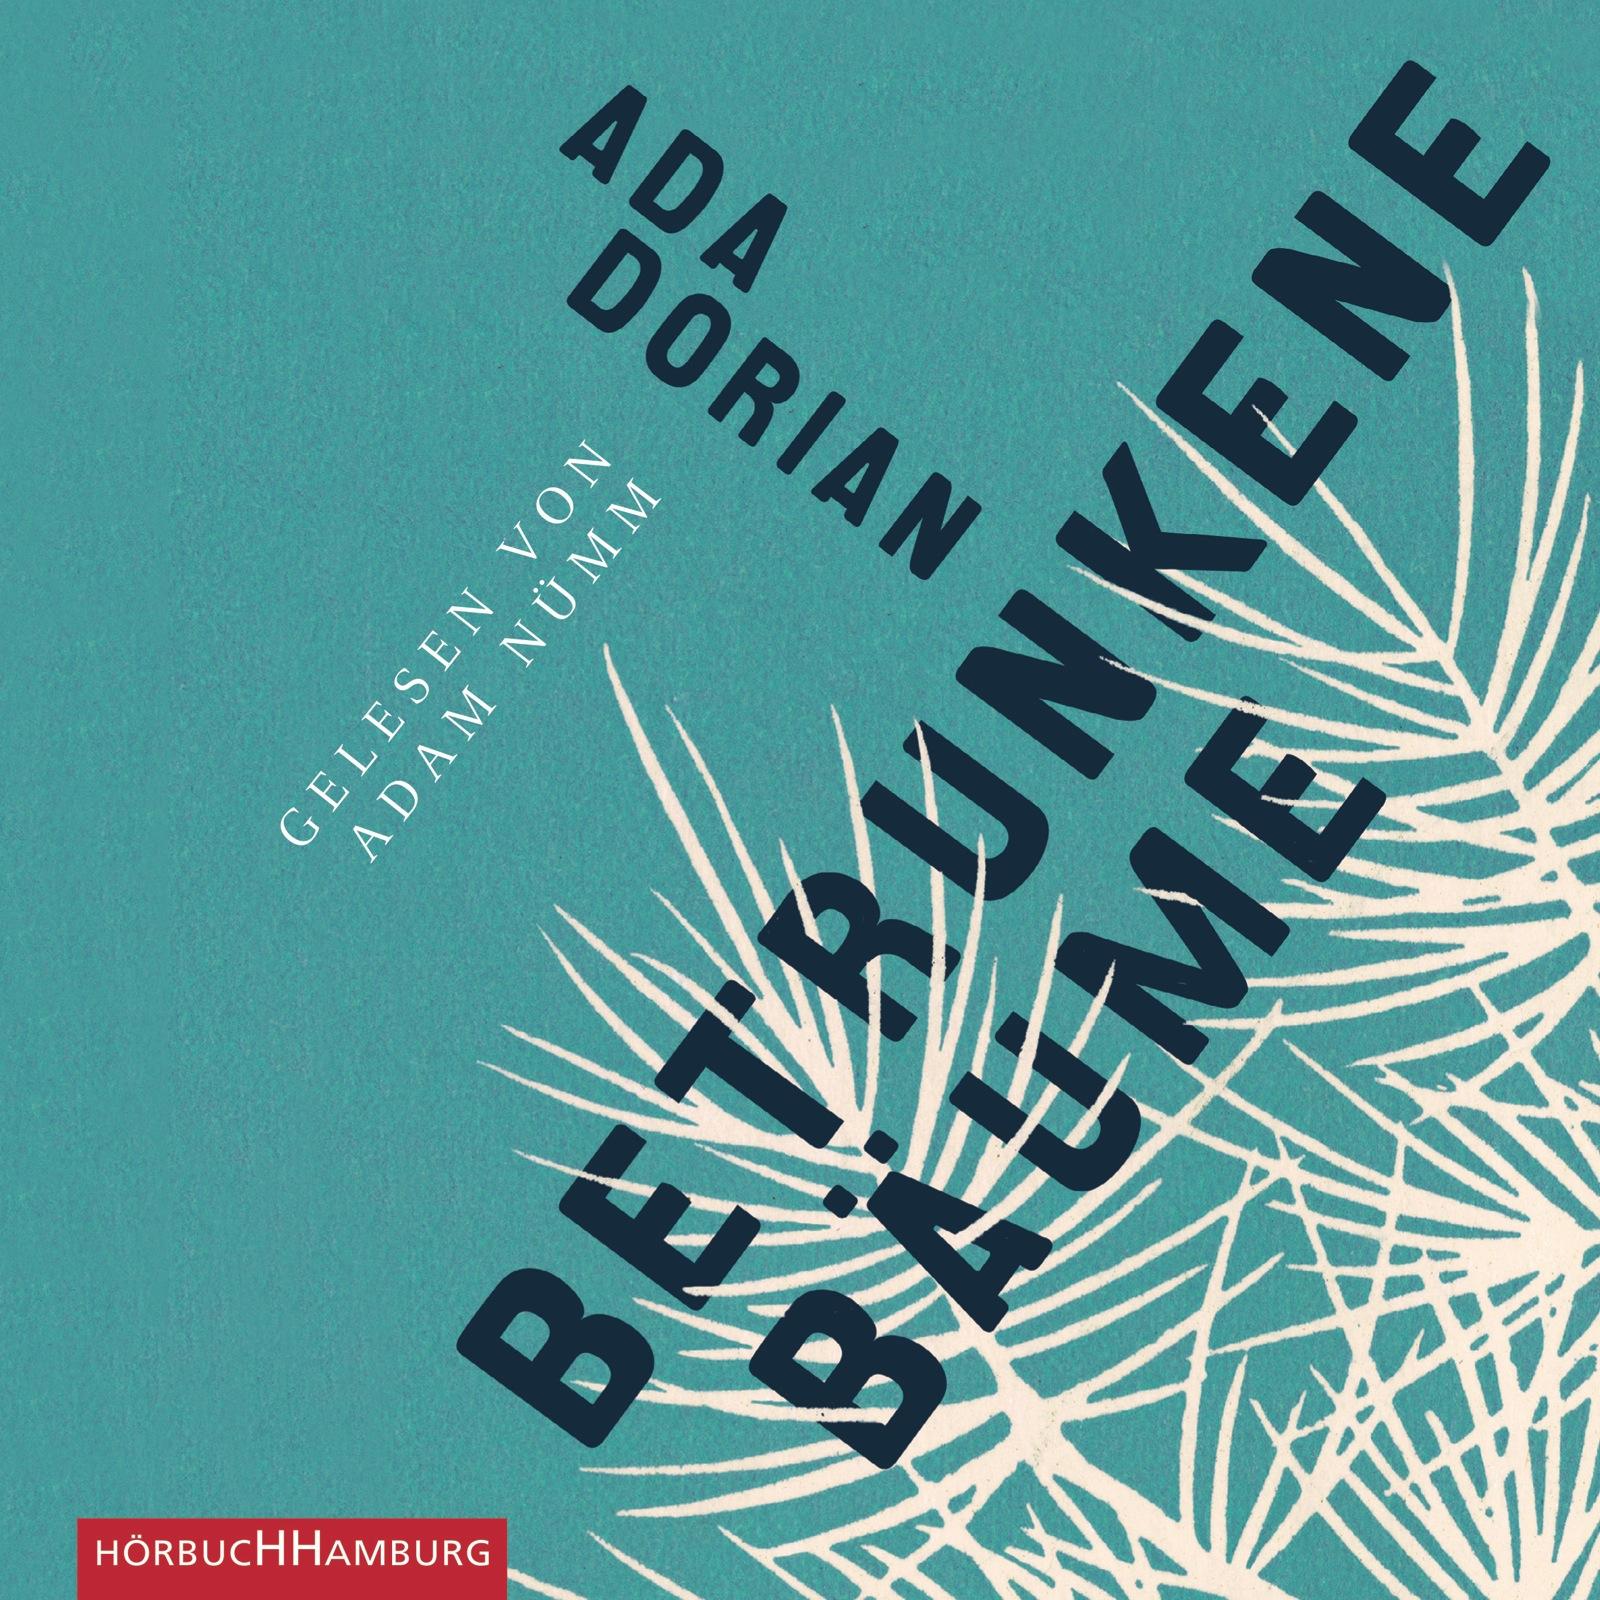 Cover für das Betrunkene Bäume Hörbuch